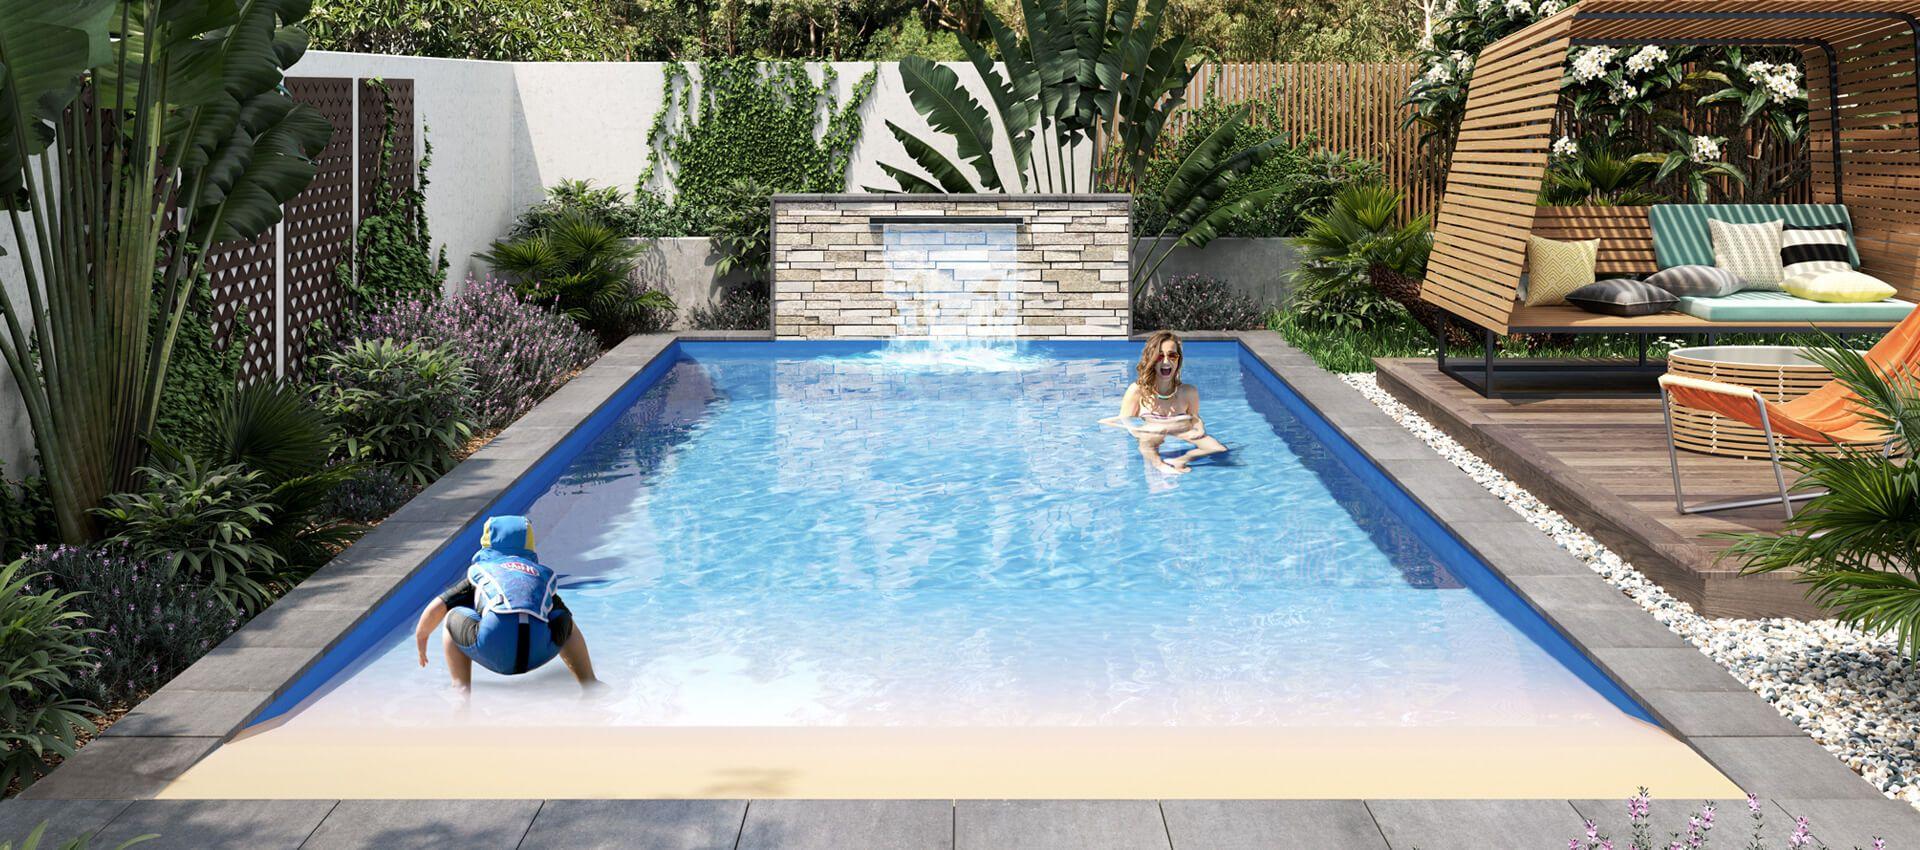 Beach Pool 7m Swimming Pools Perth Wa Freedom Pools Pool Family Pool Pool Companies